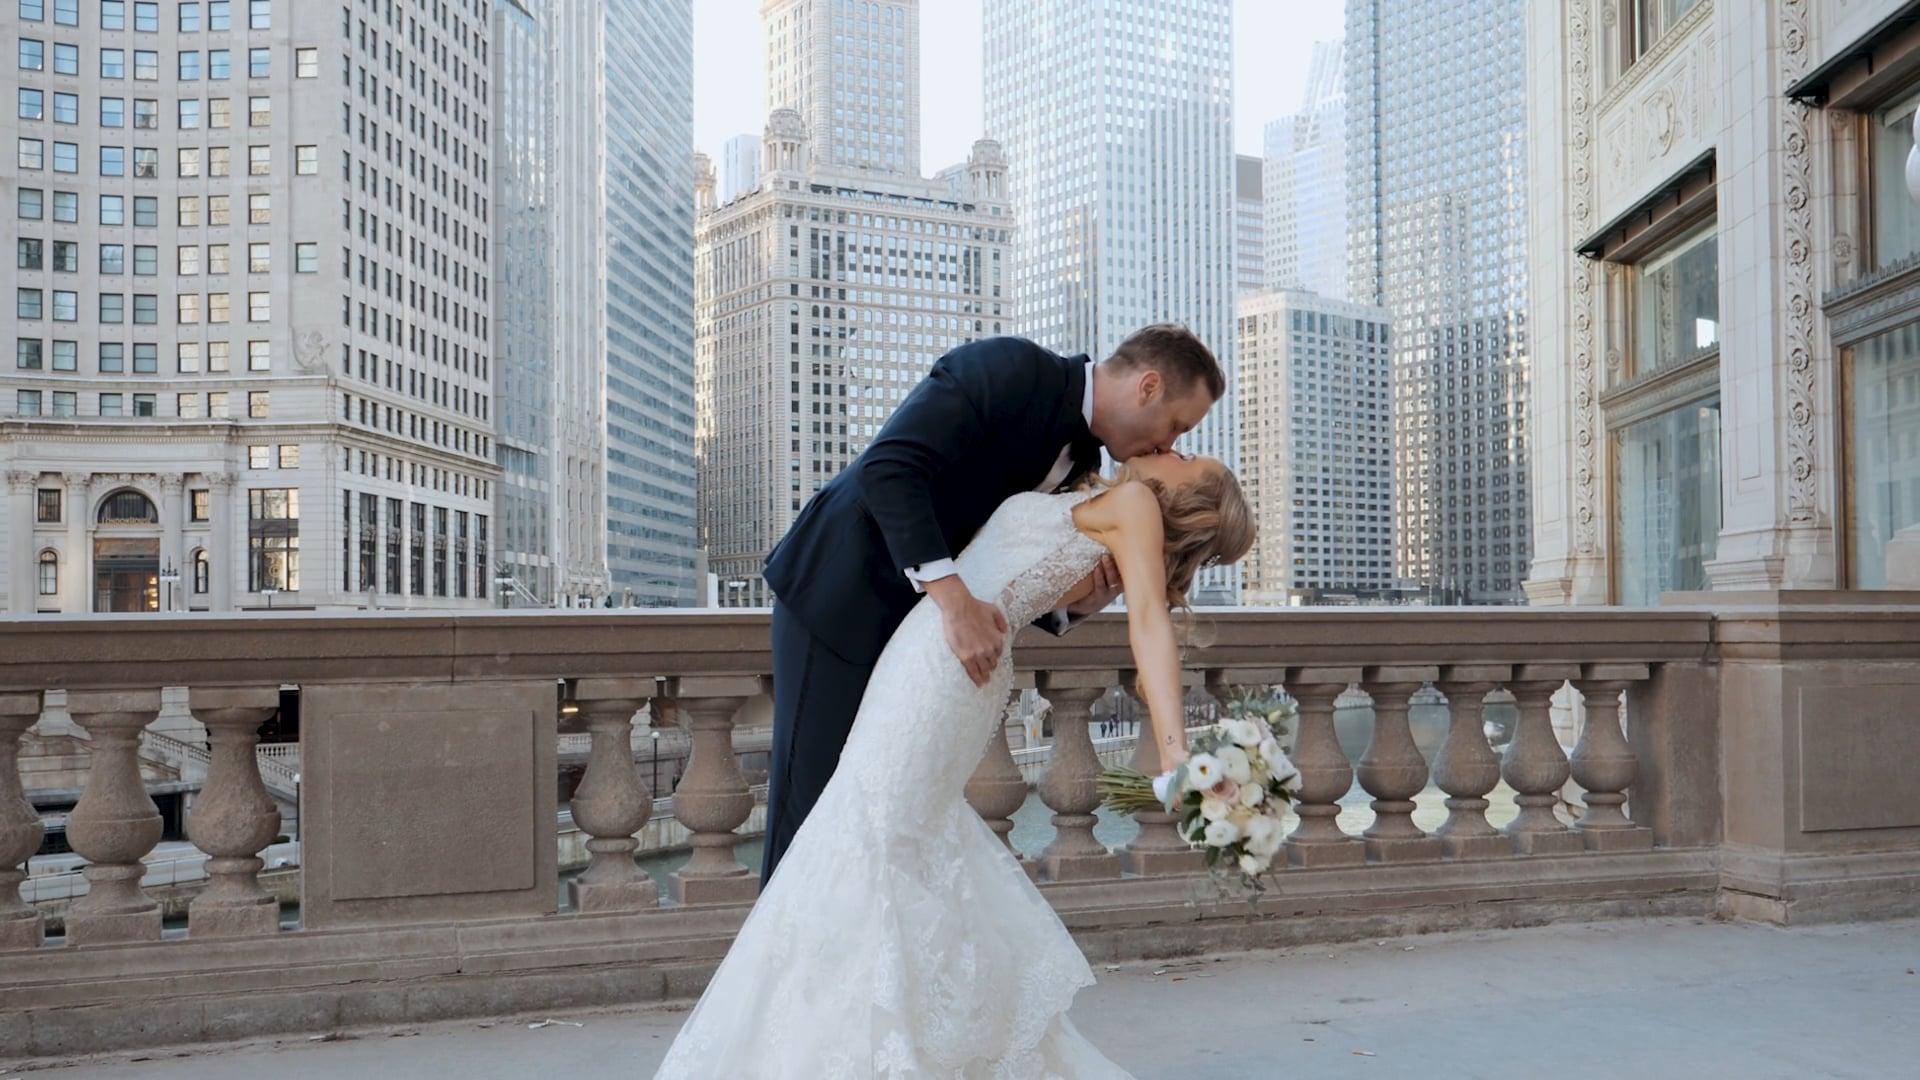 Jill + Matt   Wedding Day Highlights   3-7-2020   the Zephyr, Chicago, IL